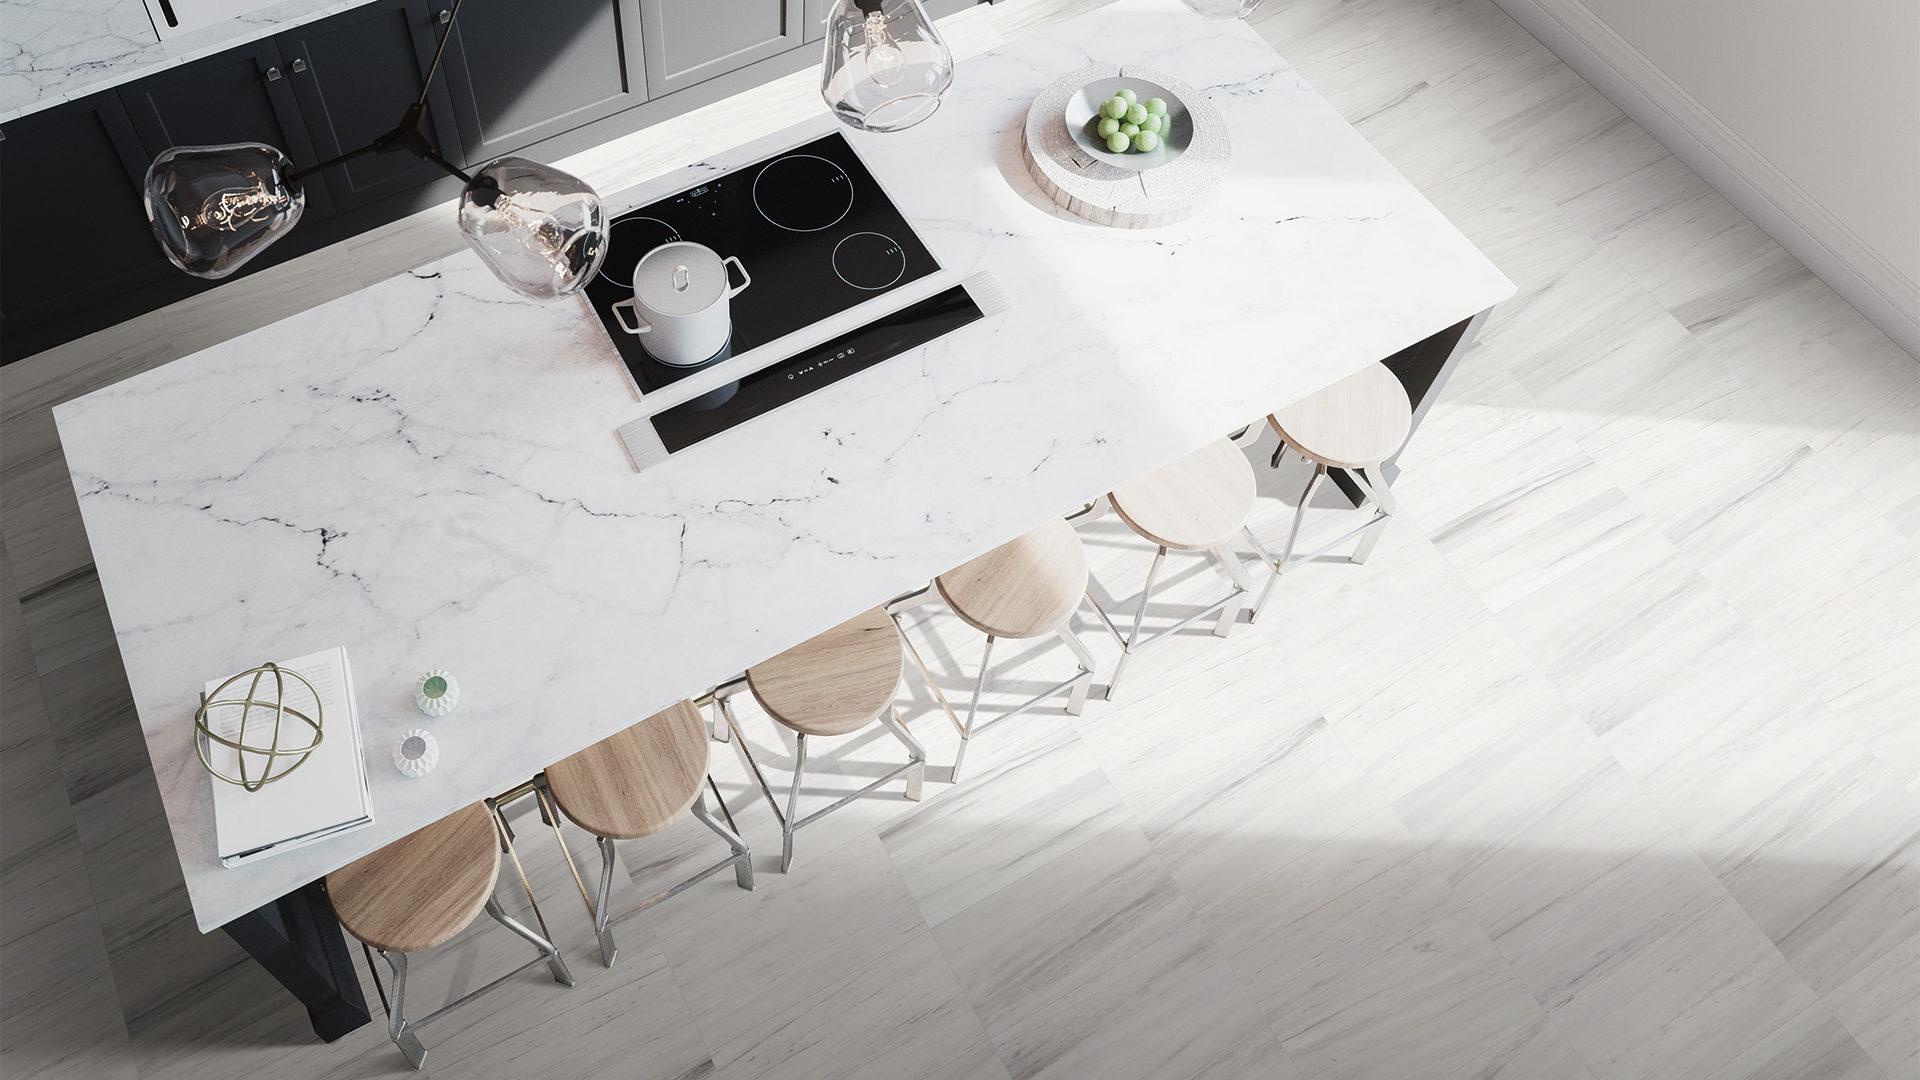 12x24-bianco-nuvo-hd-polished-rectified-porcelain-1920x1080.jpg